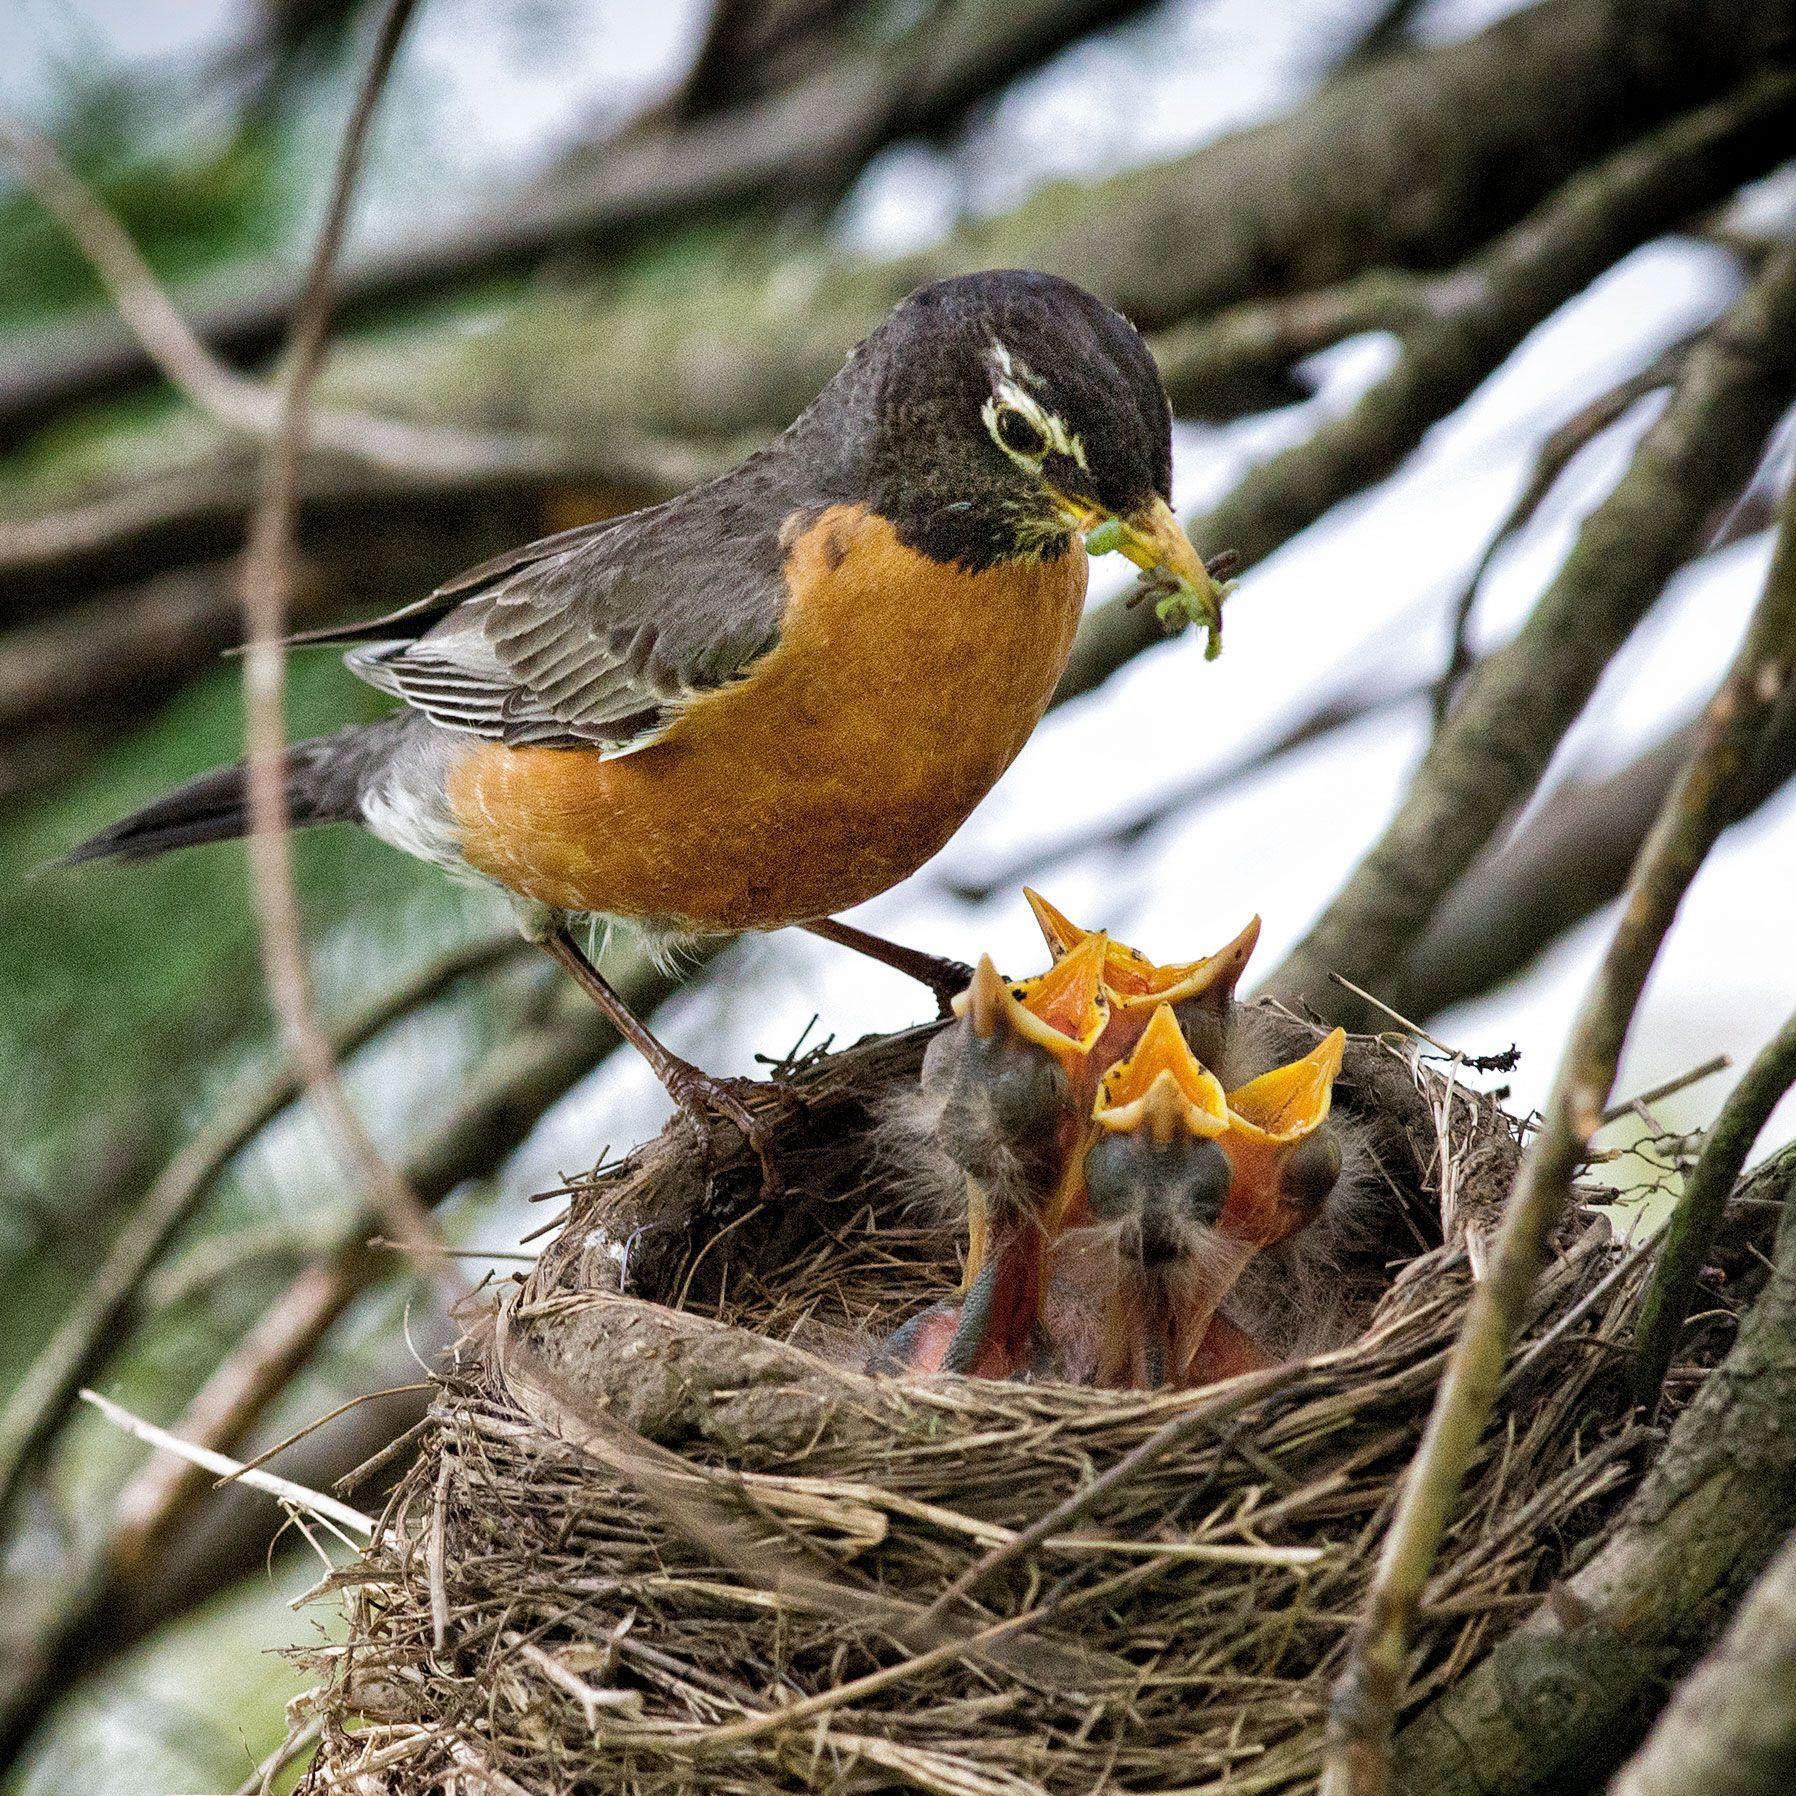 47681034d7942230e4f0cc4431deb156 - How To Get A Wild Baby Bird To Eat